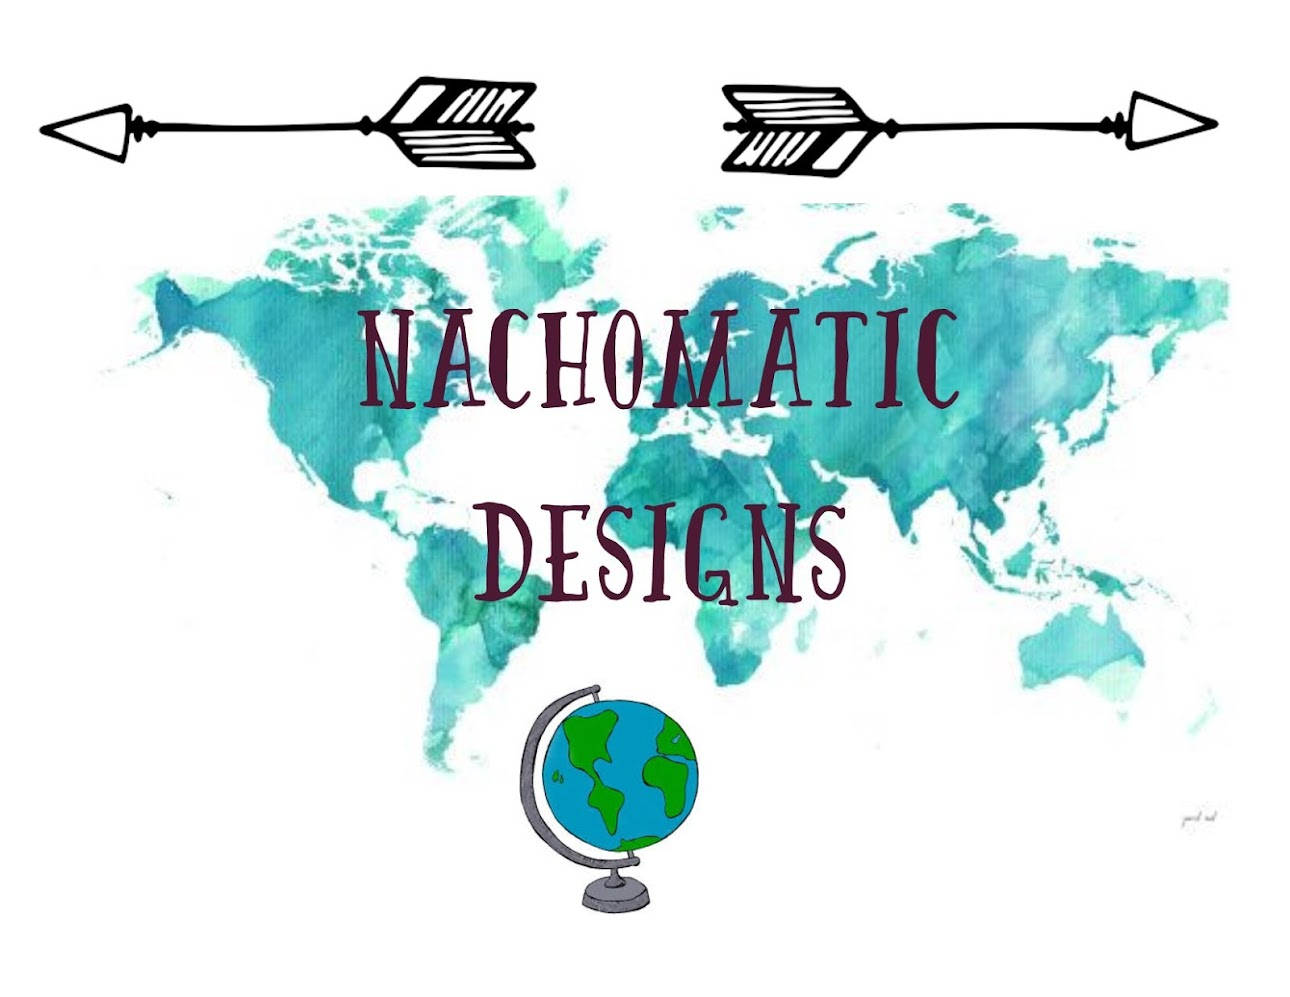 NachoMatic Designs